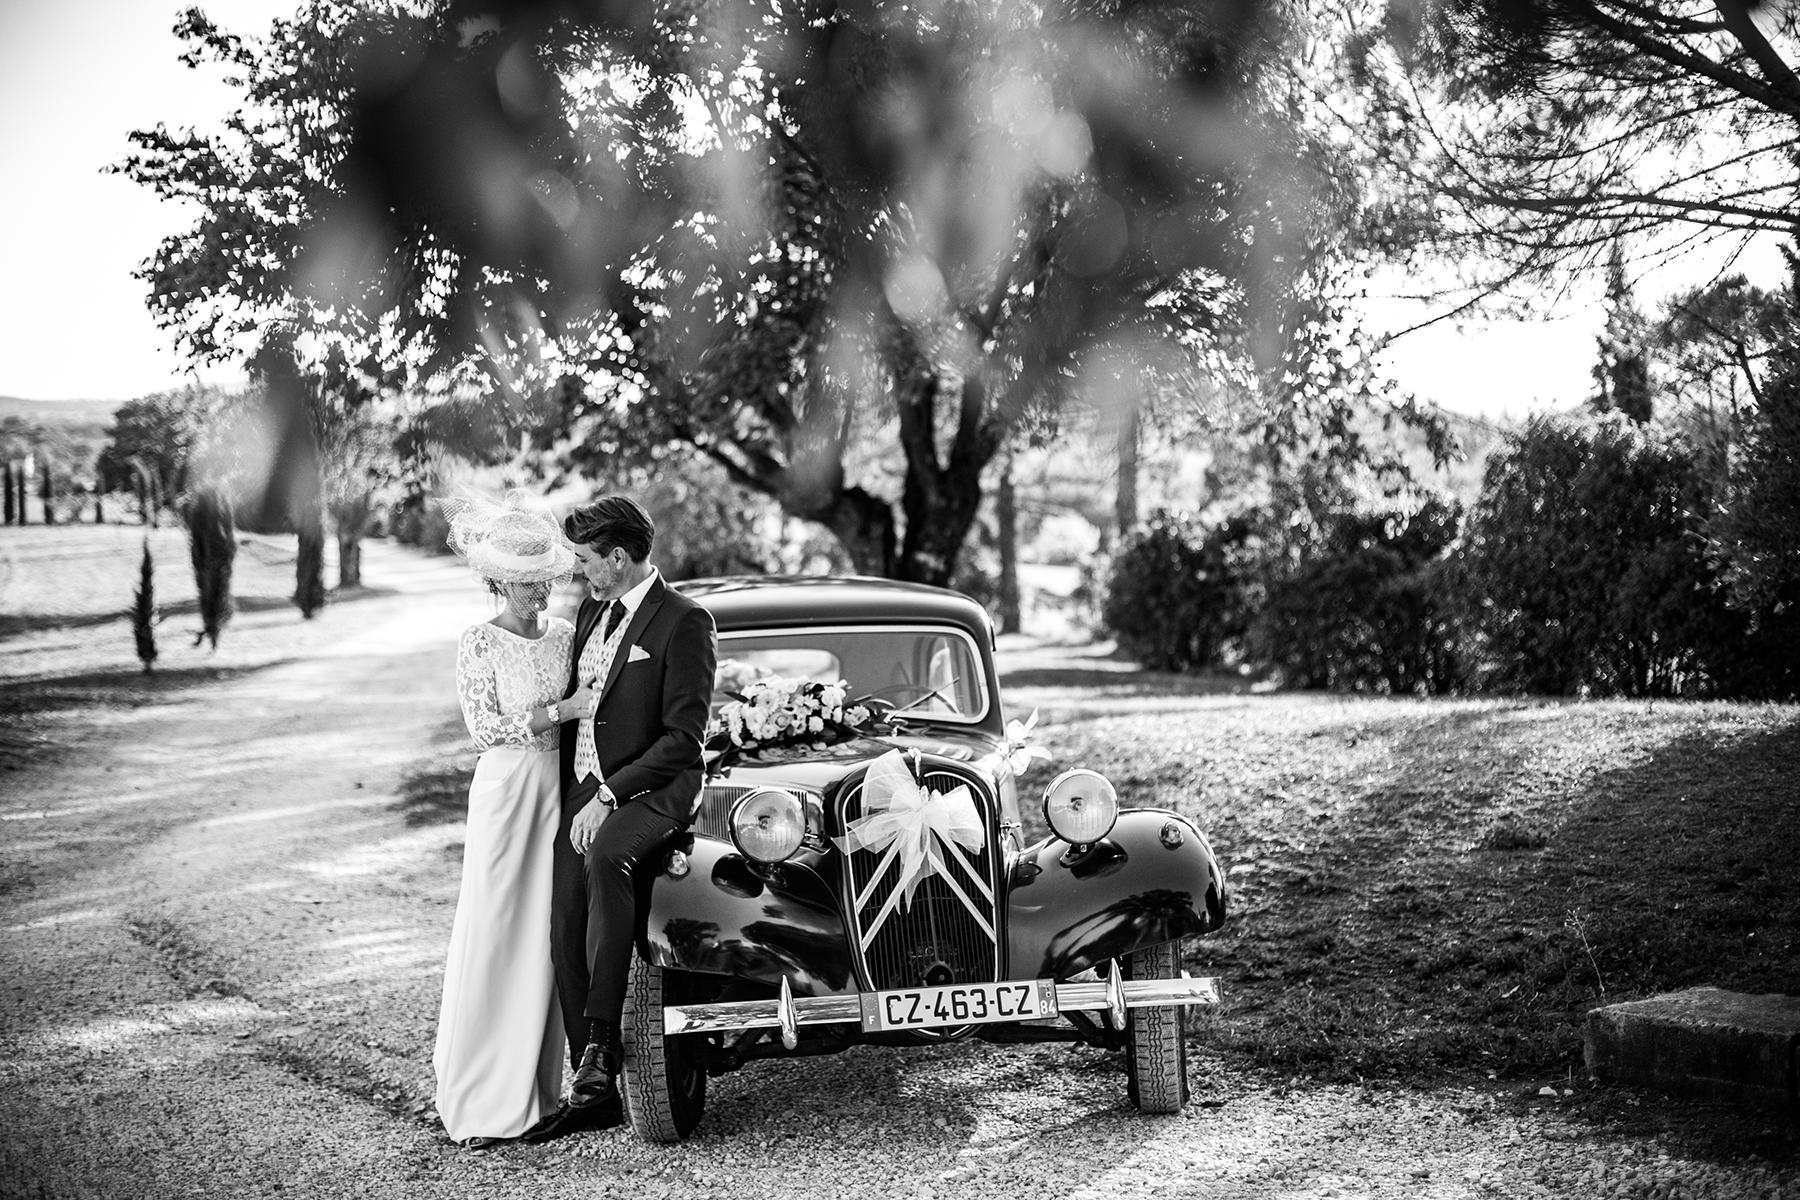 Reportage de mariage au soleil